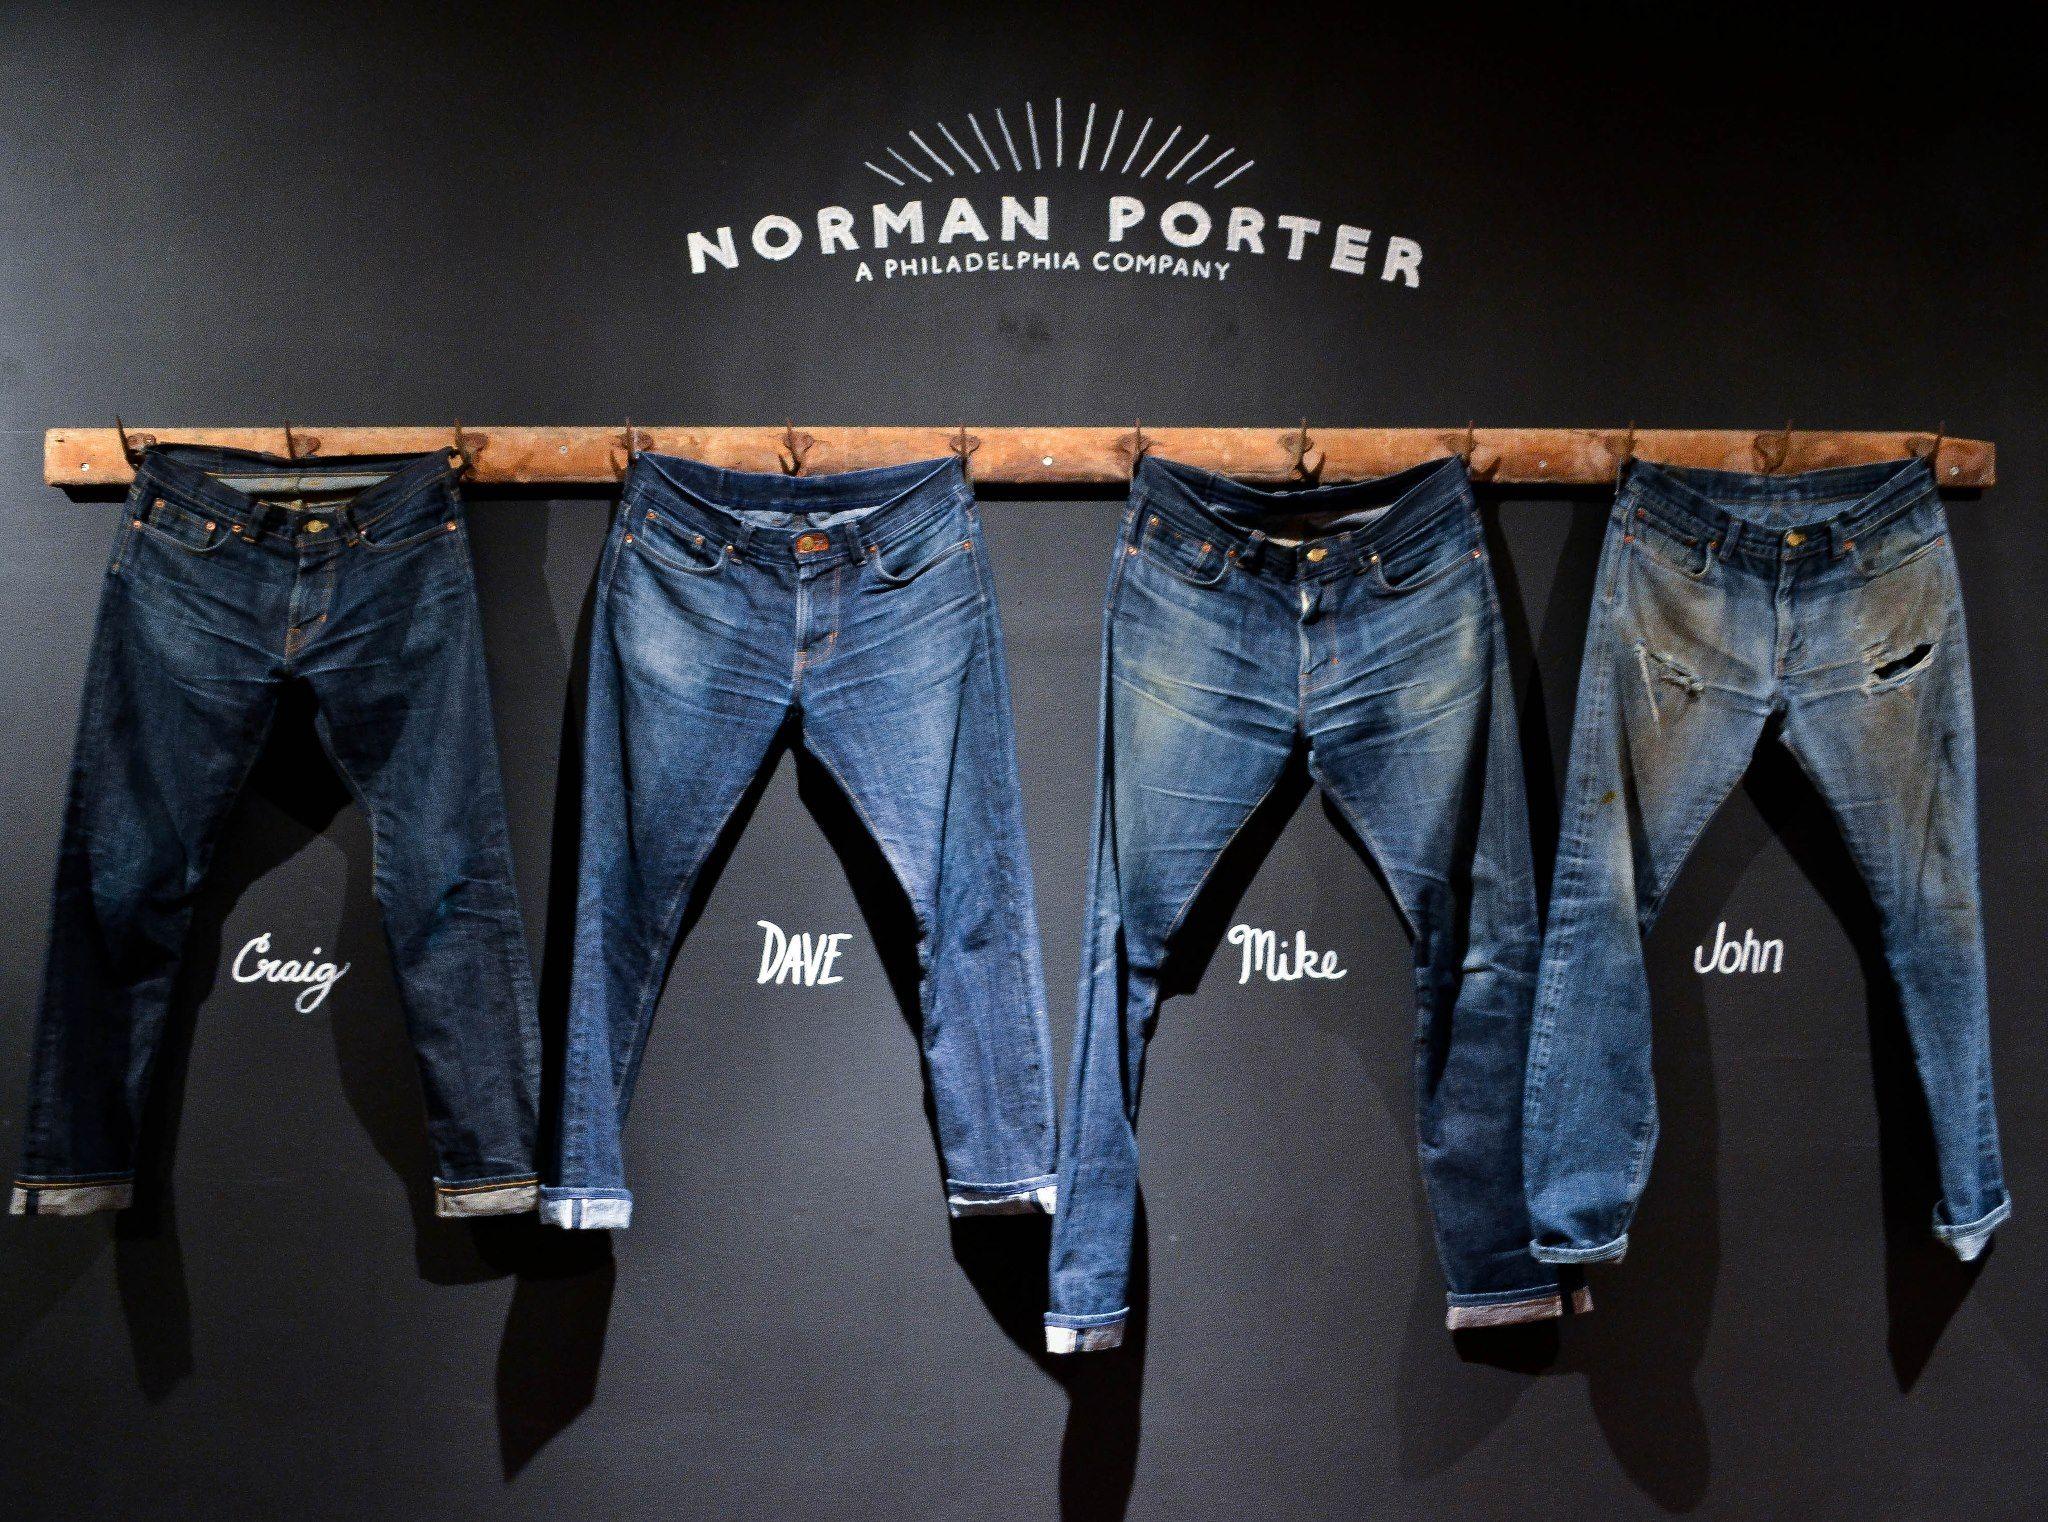 norman porter jeans logo - Google Search